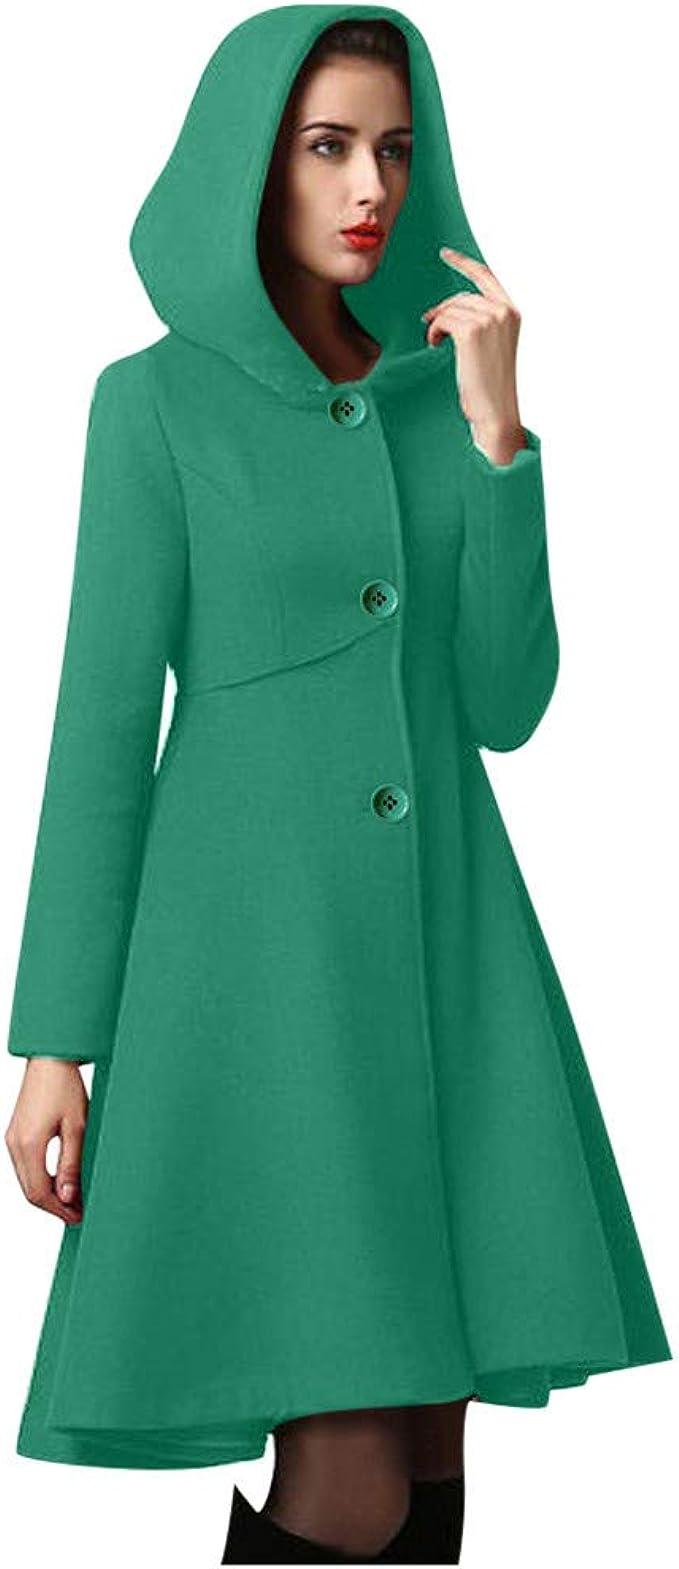 manteau vert femme pas cher